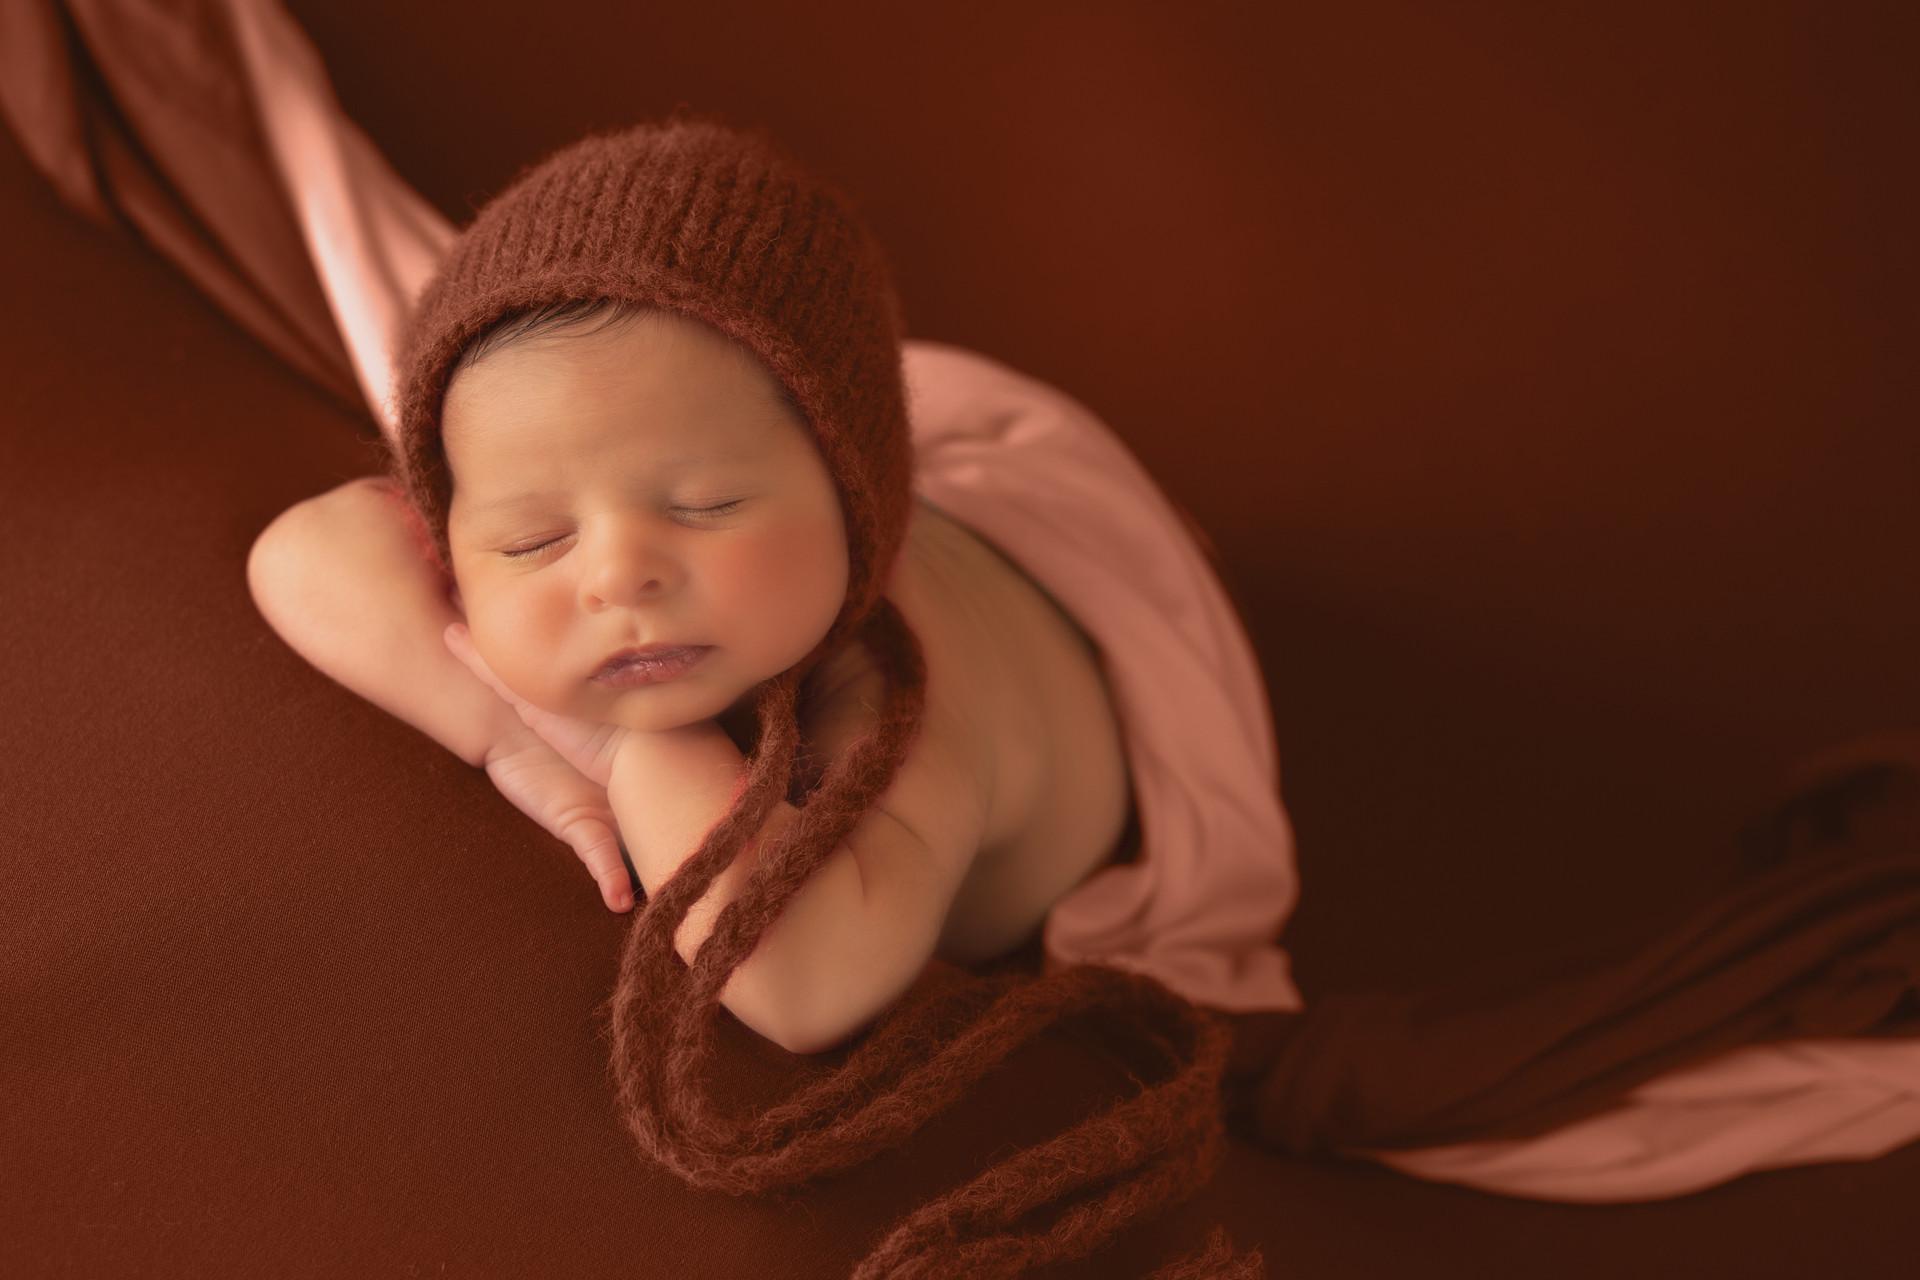 fotografo-newborn-zaragoza-recien-nacido.jpg